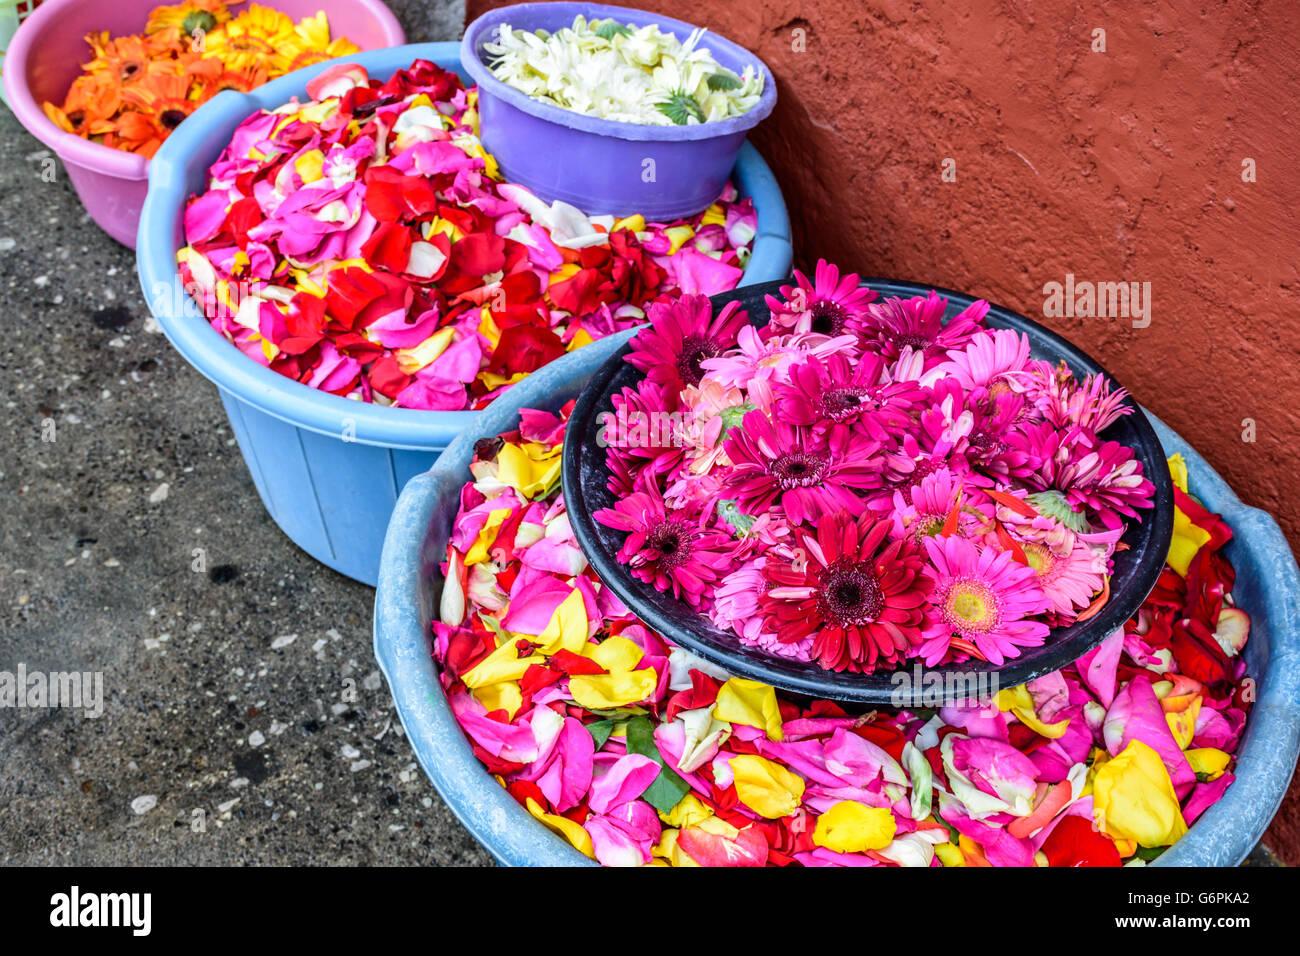 Rose Week Stock Photos & Rose Week Stock Images - Alamy